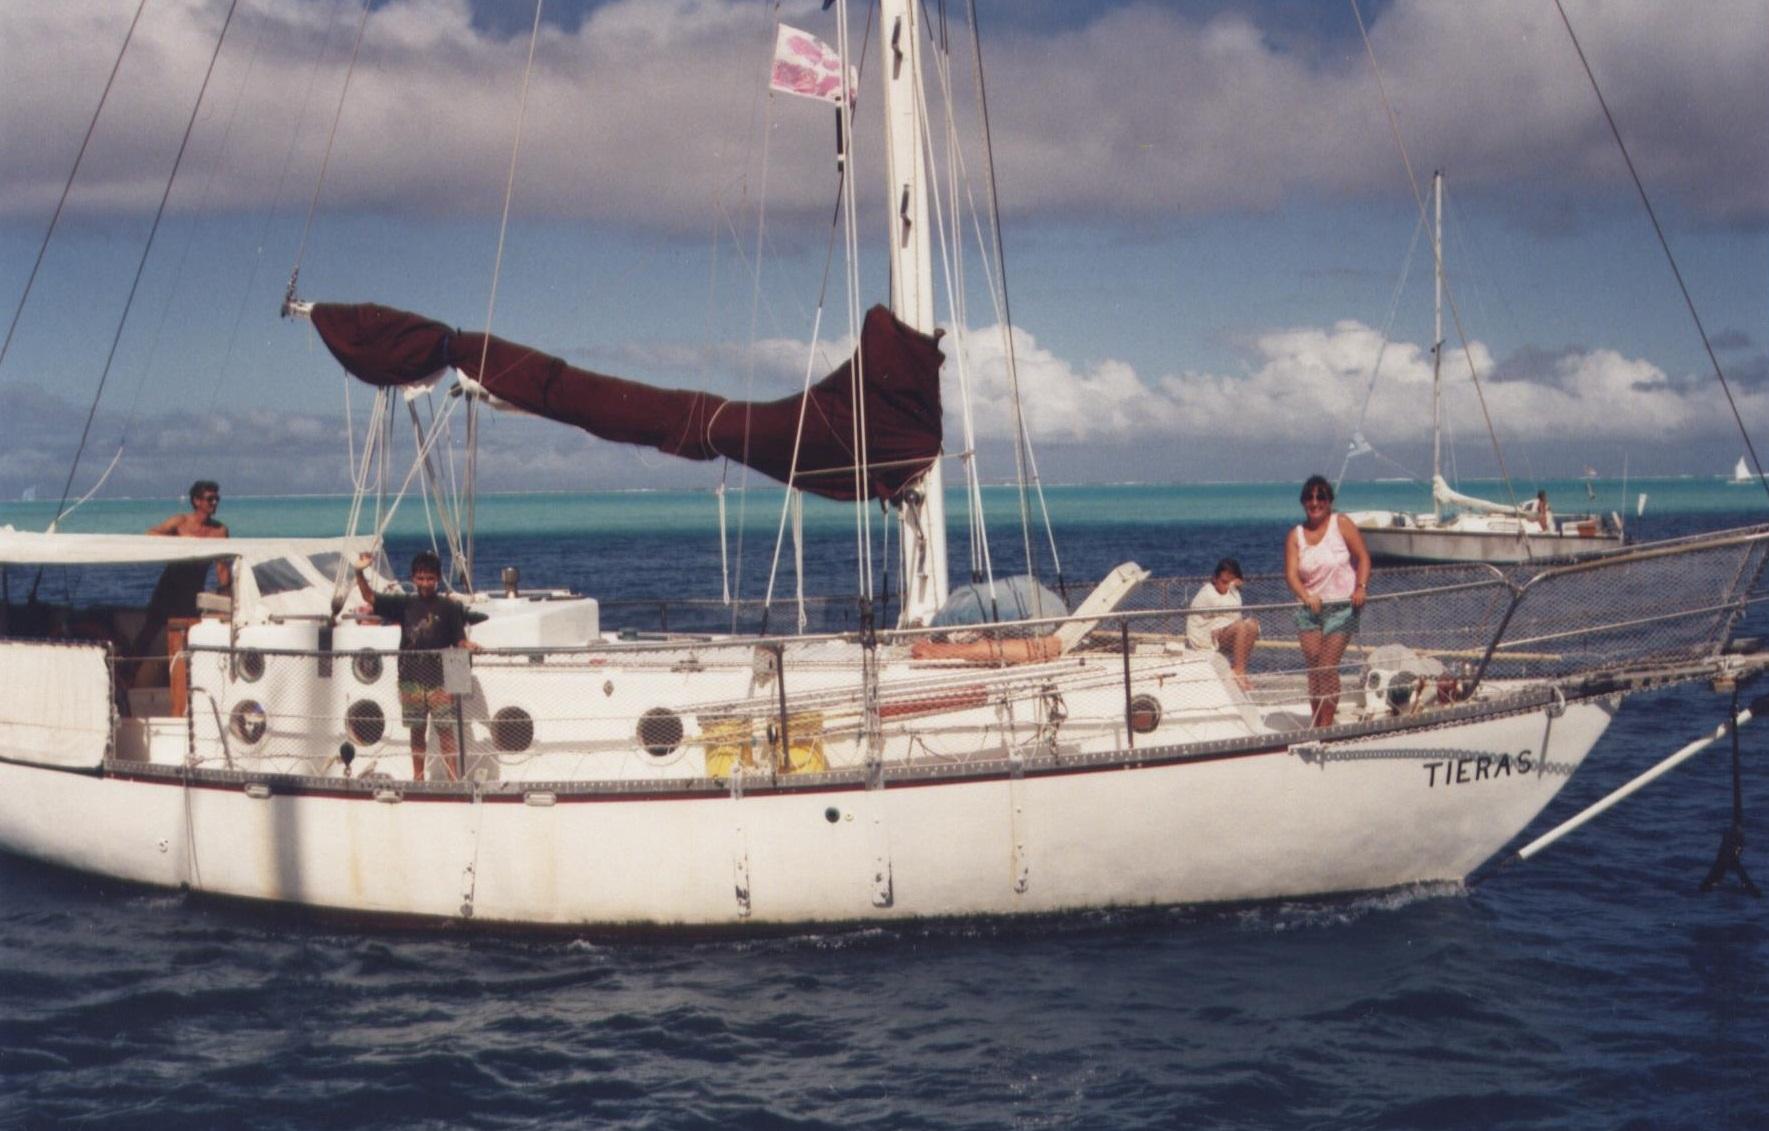 Tieras in Bora Bora cropped